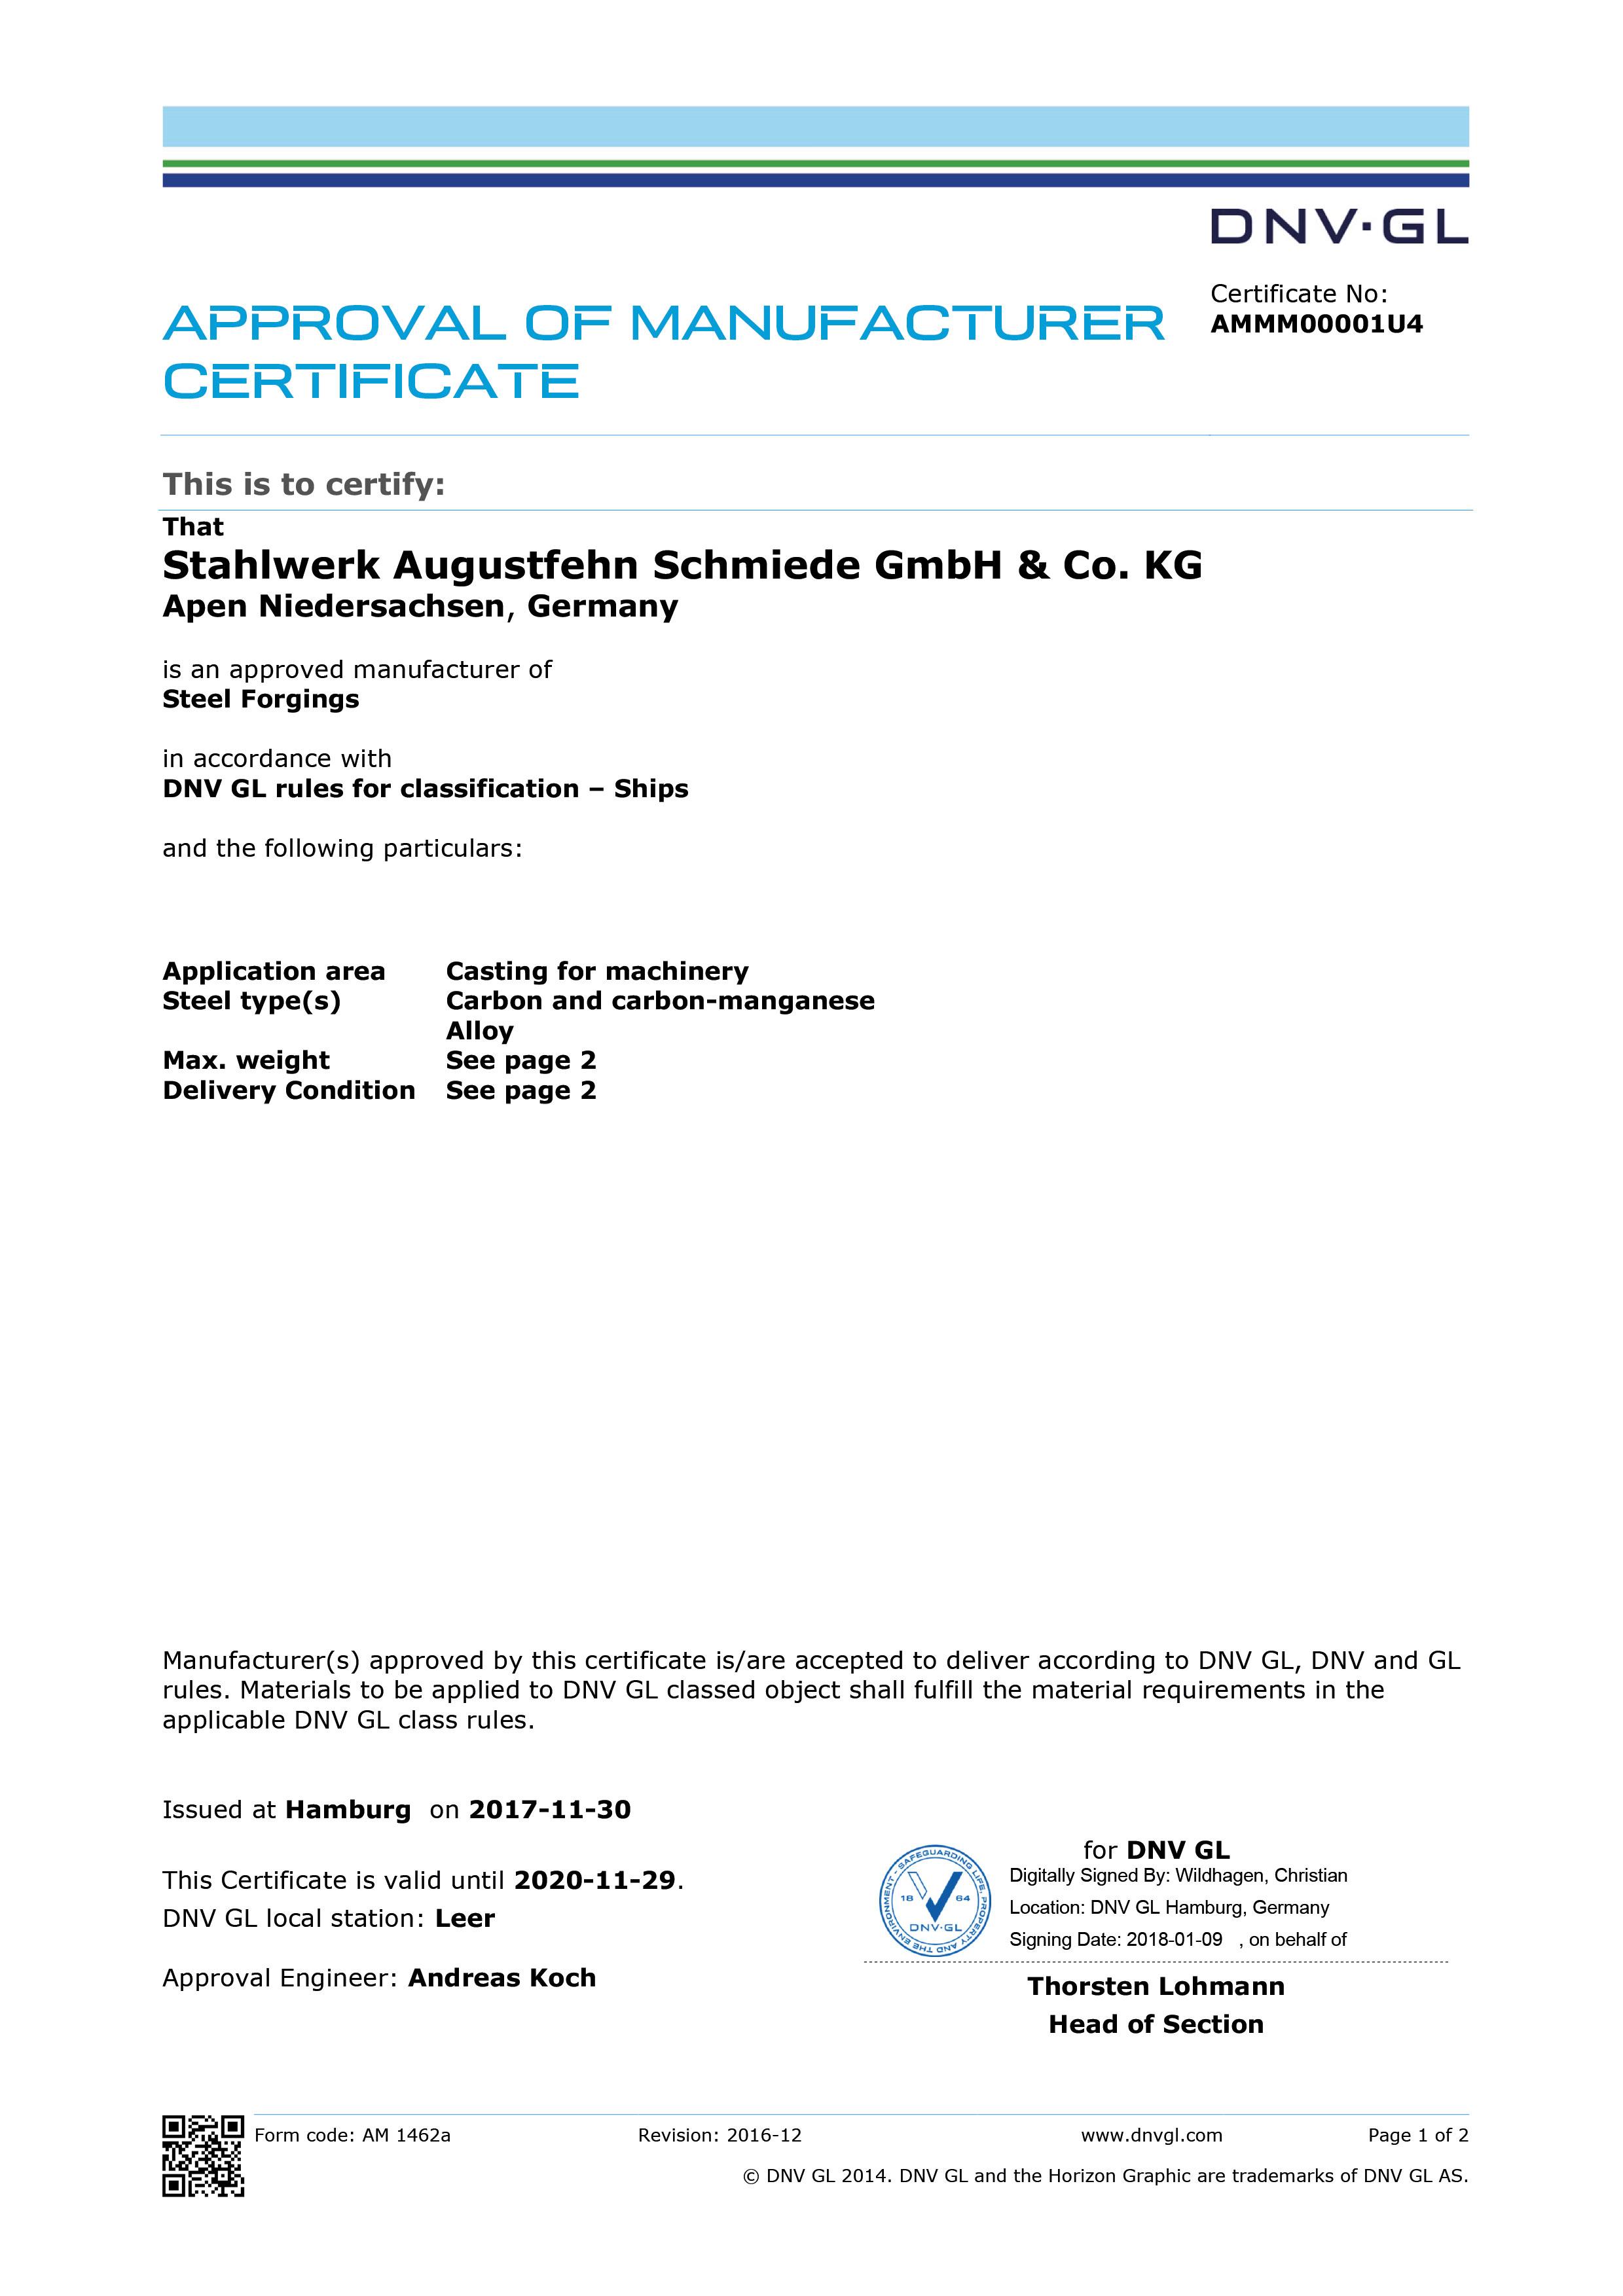 DNVGL-Zertifikat_AMMM00001U4_2017.11